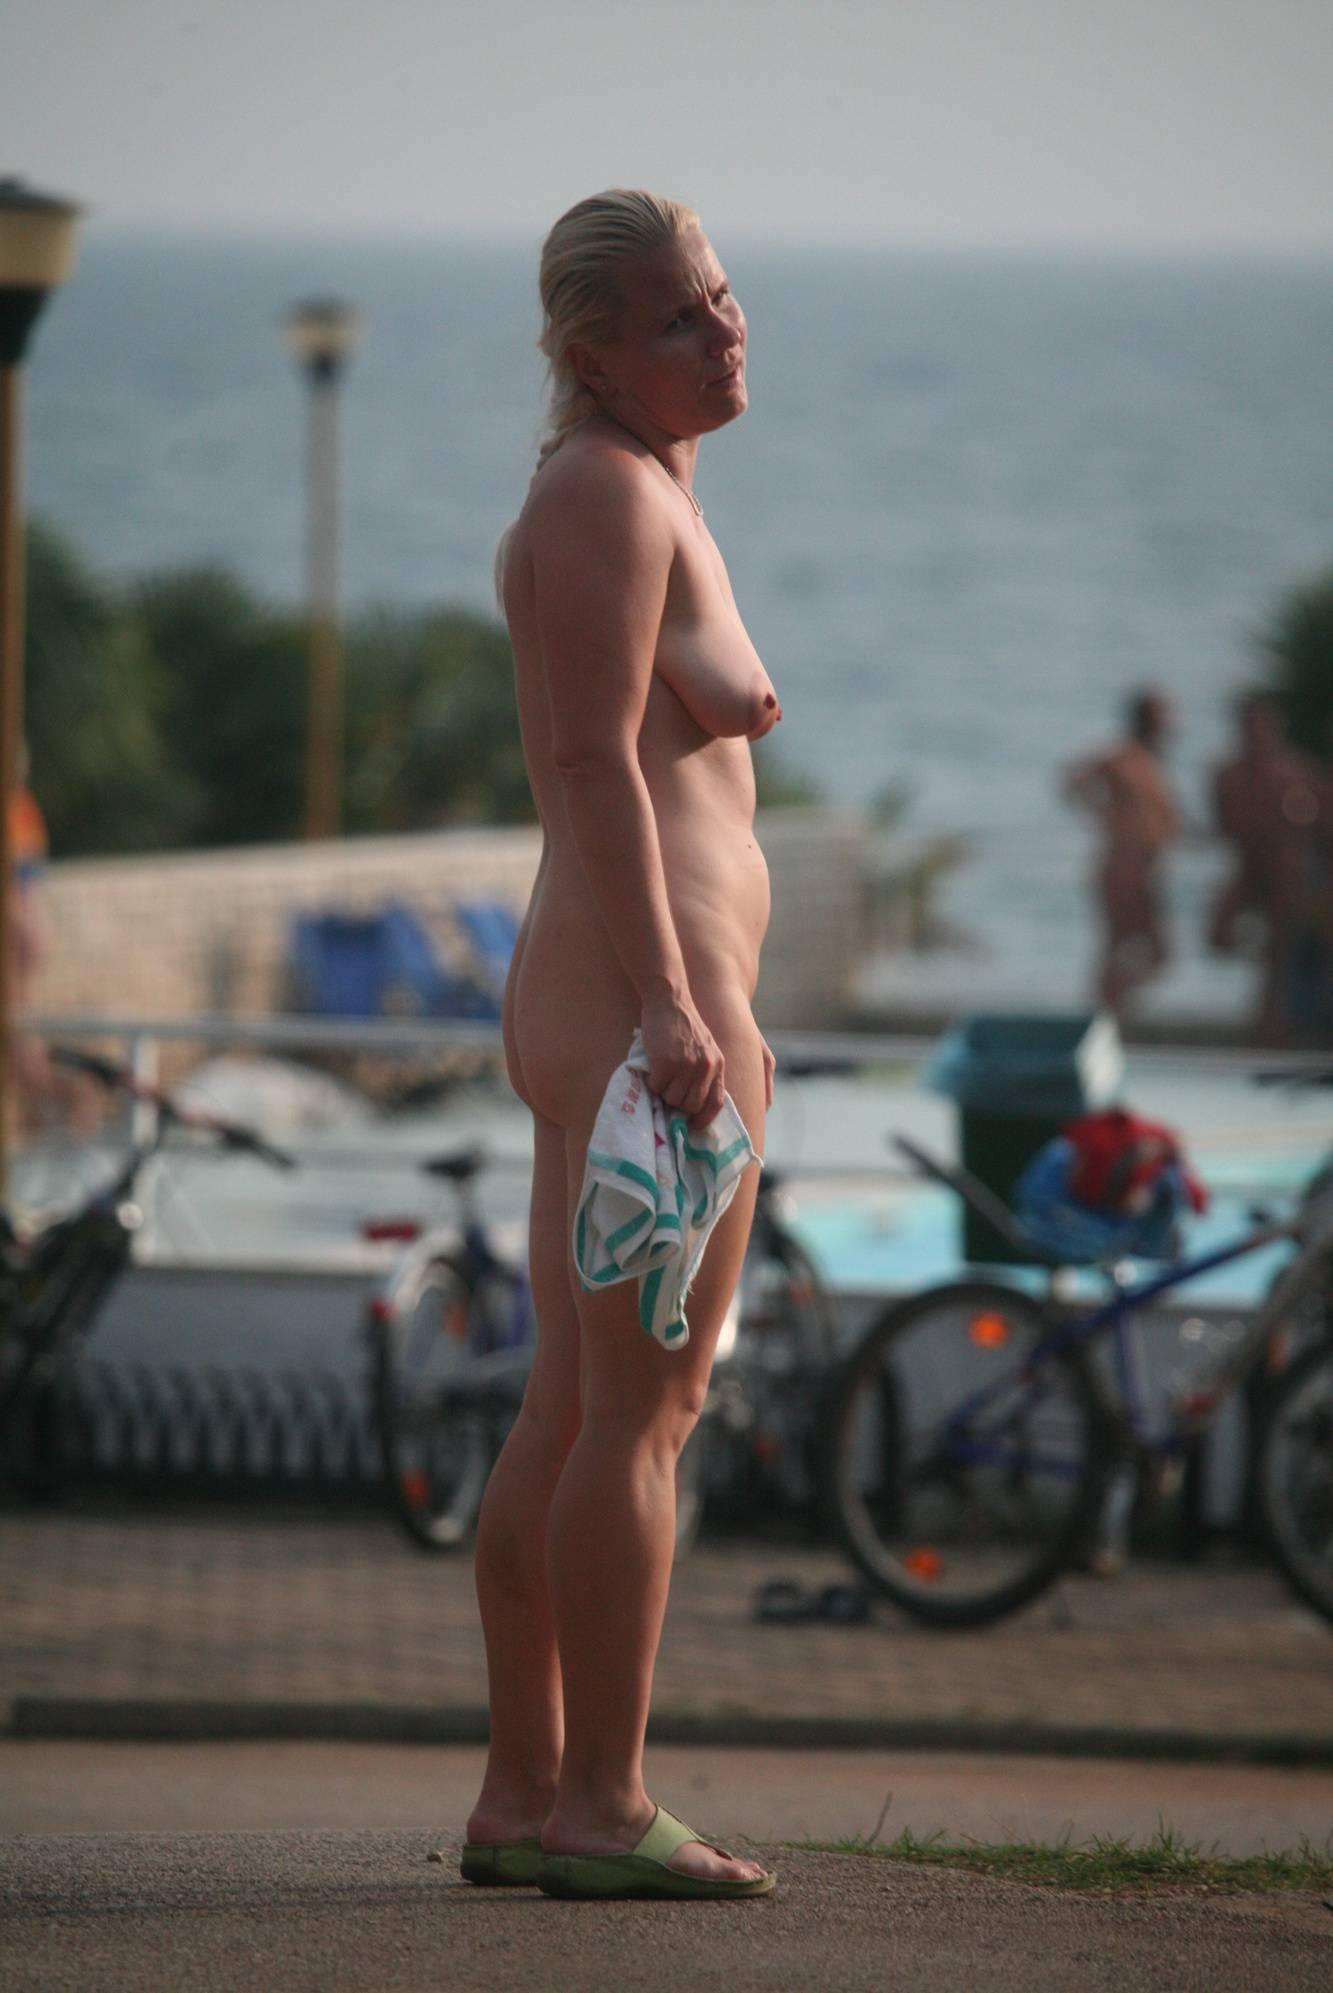 Nudist Pictures Crete Poolside Observers - 1